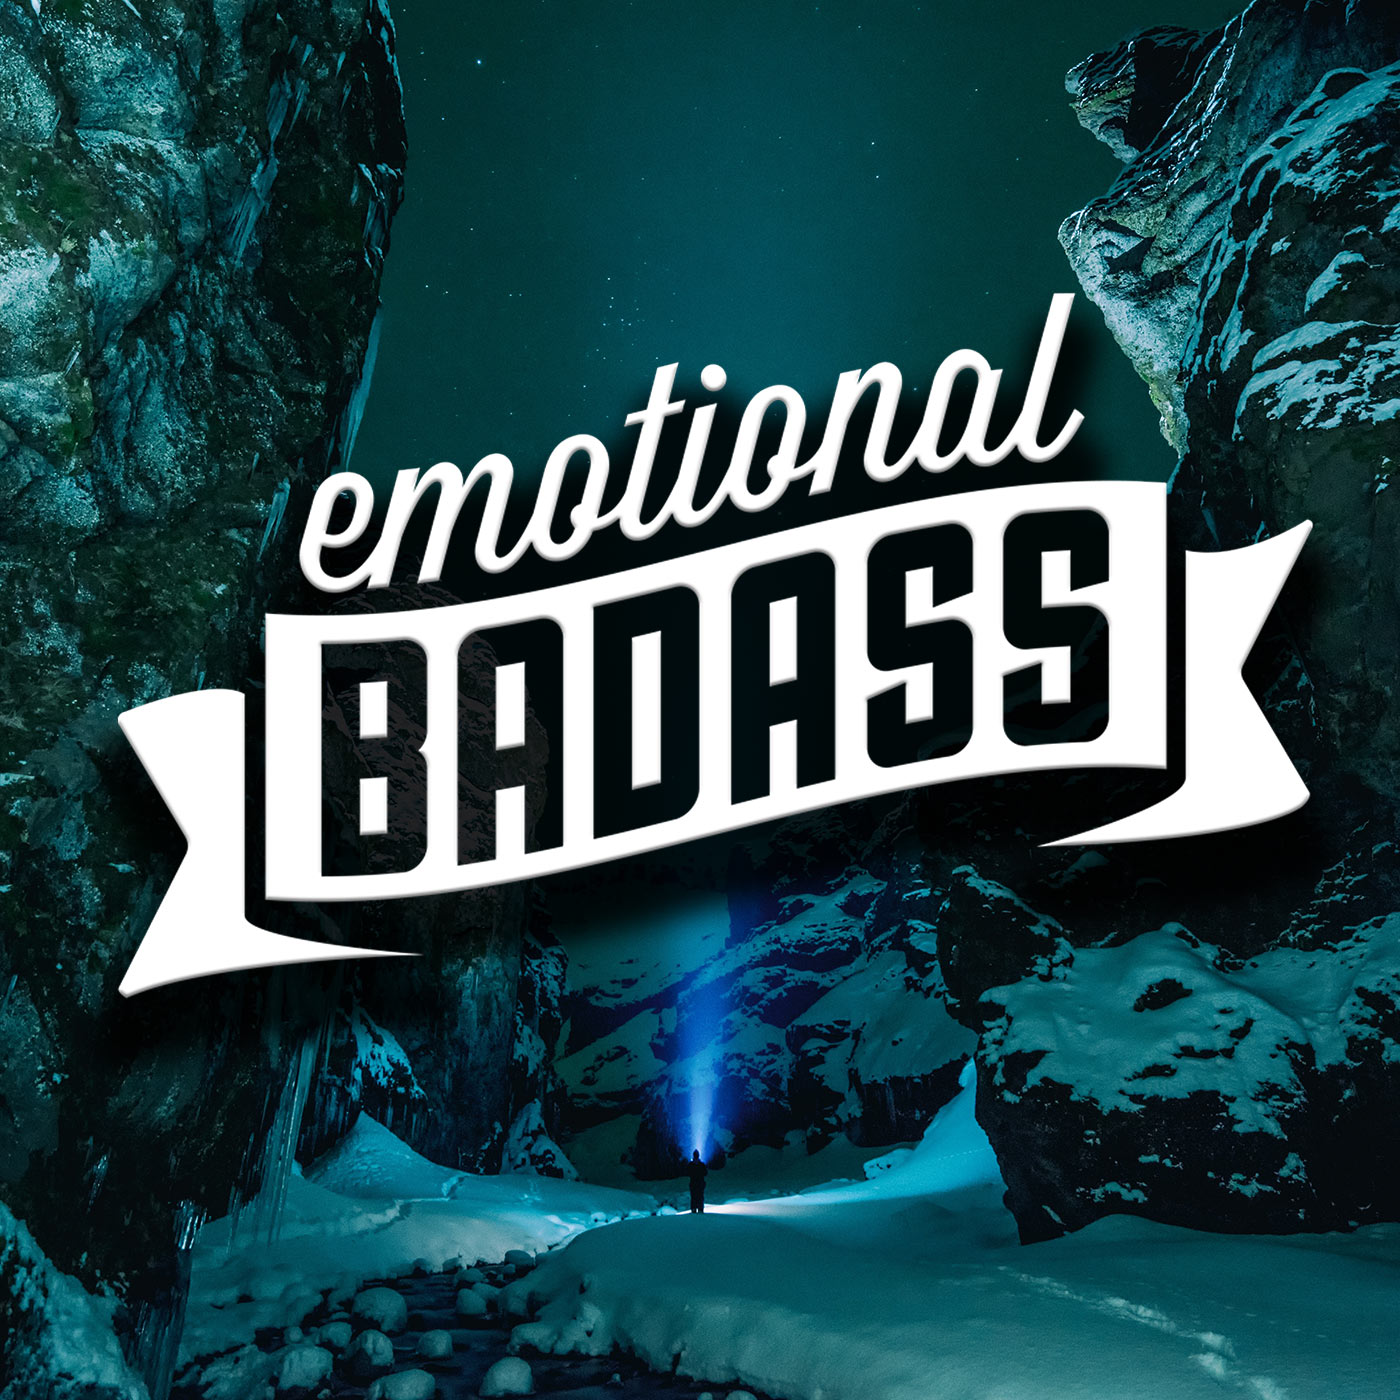 Emotional Badass